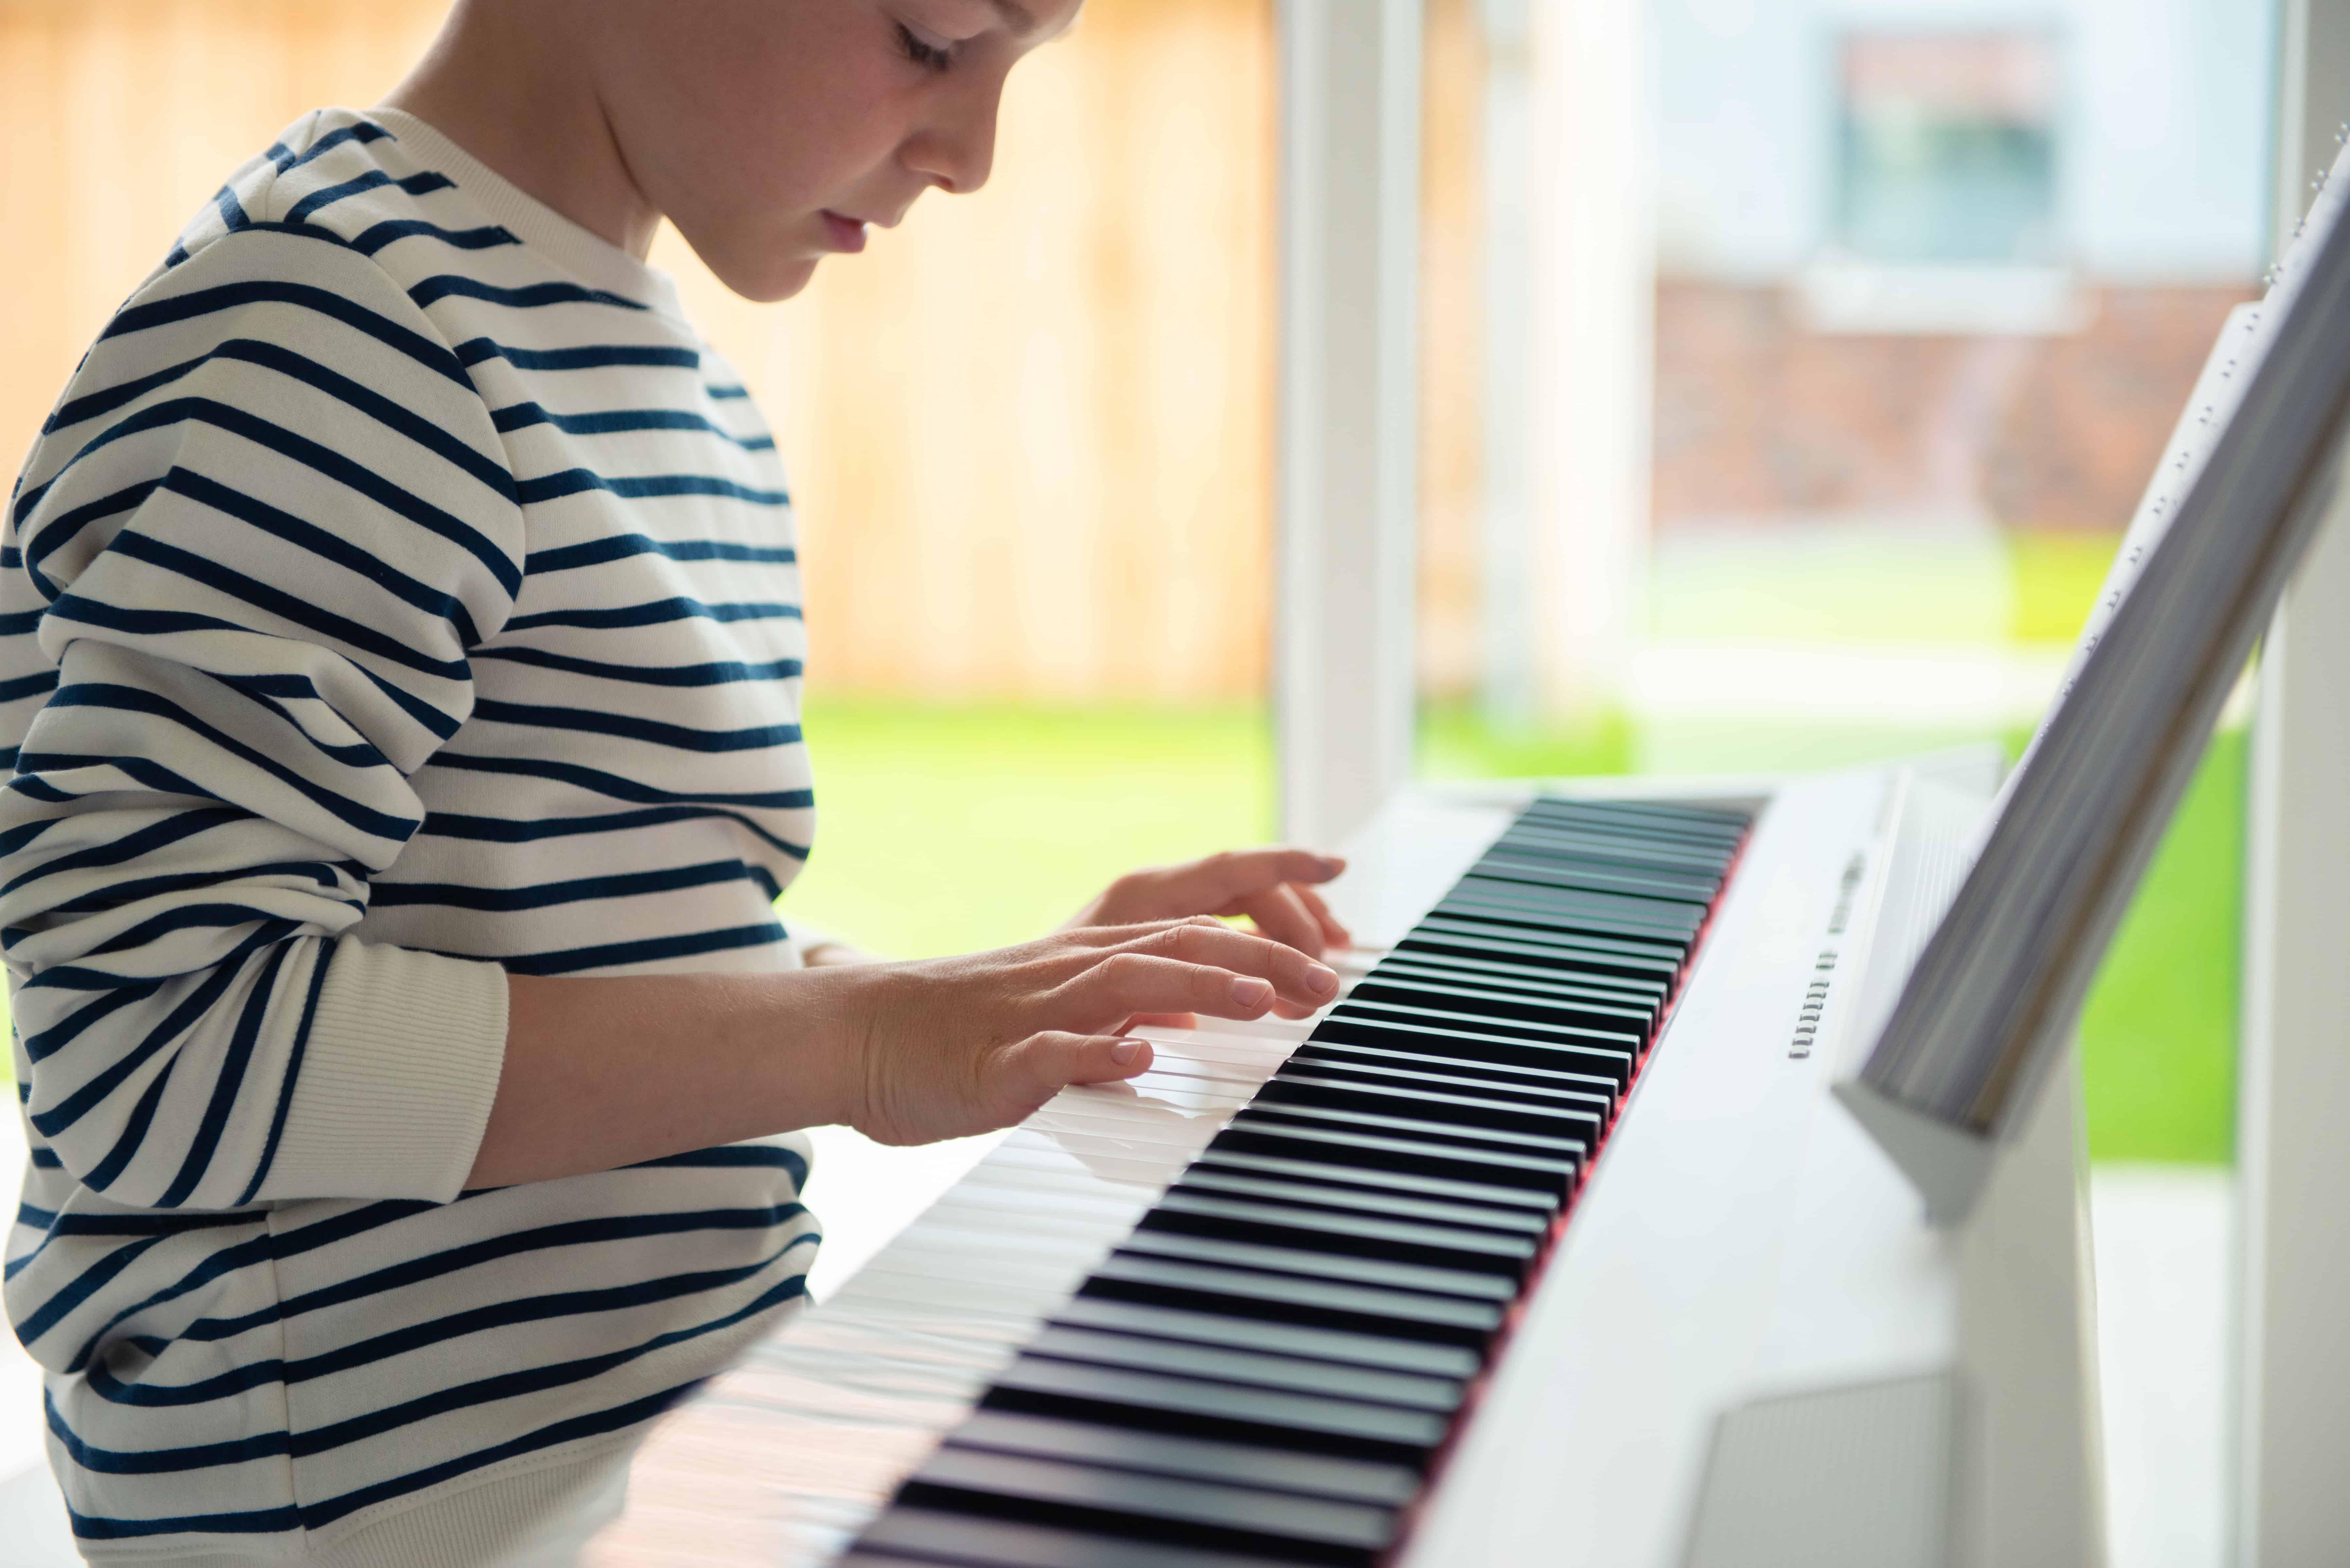 E-Piano: Test & Empfehlungen (01/20)